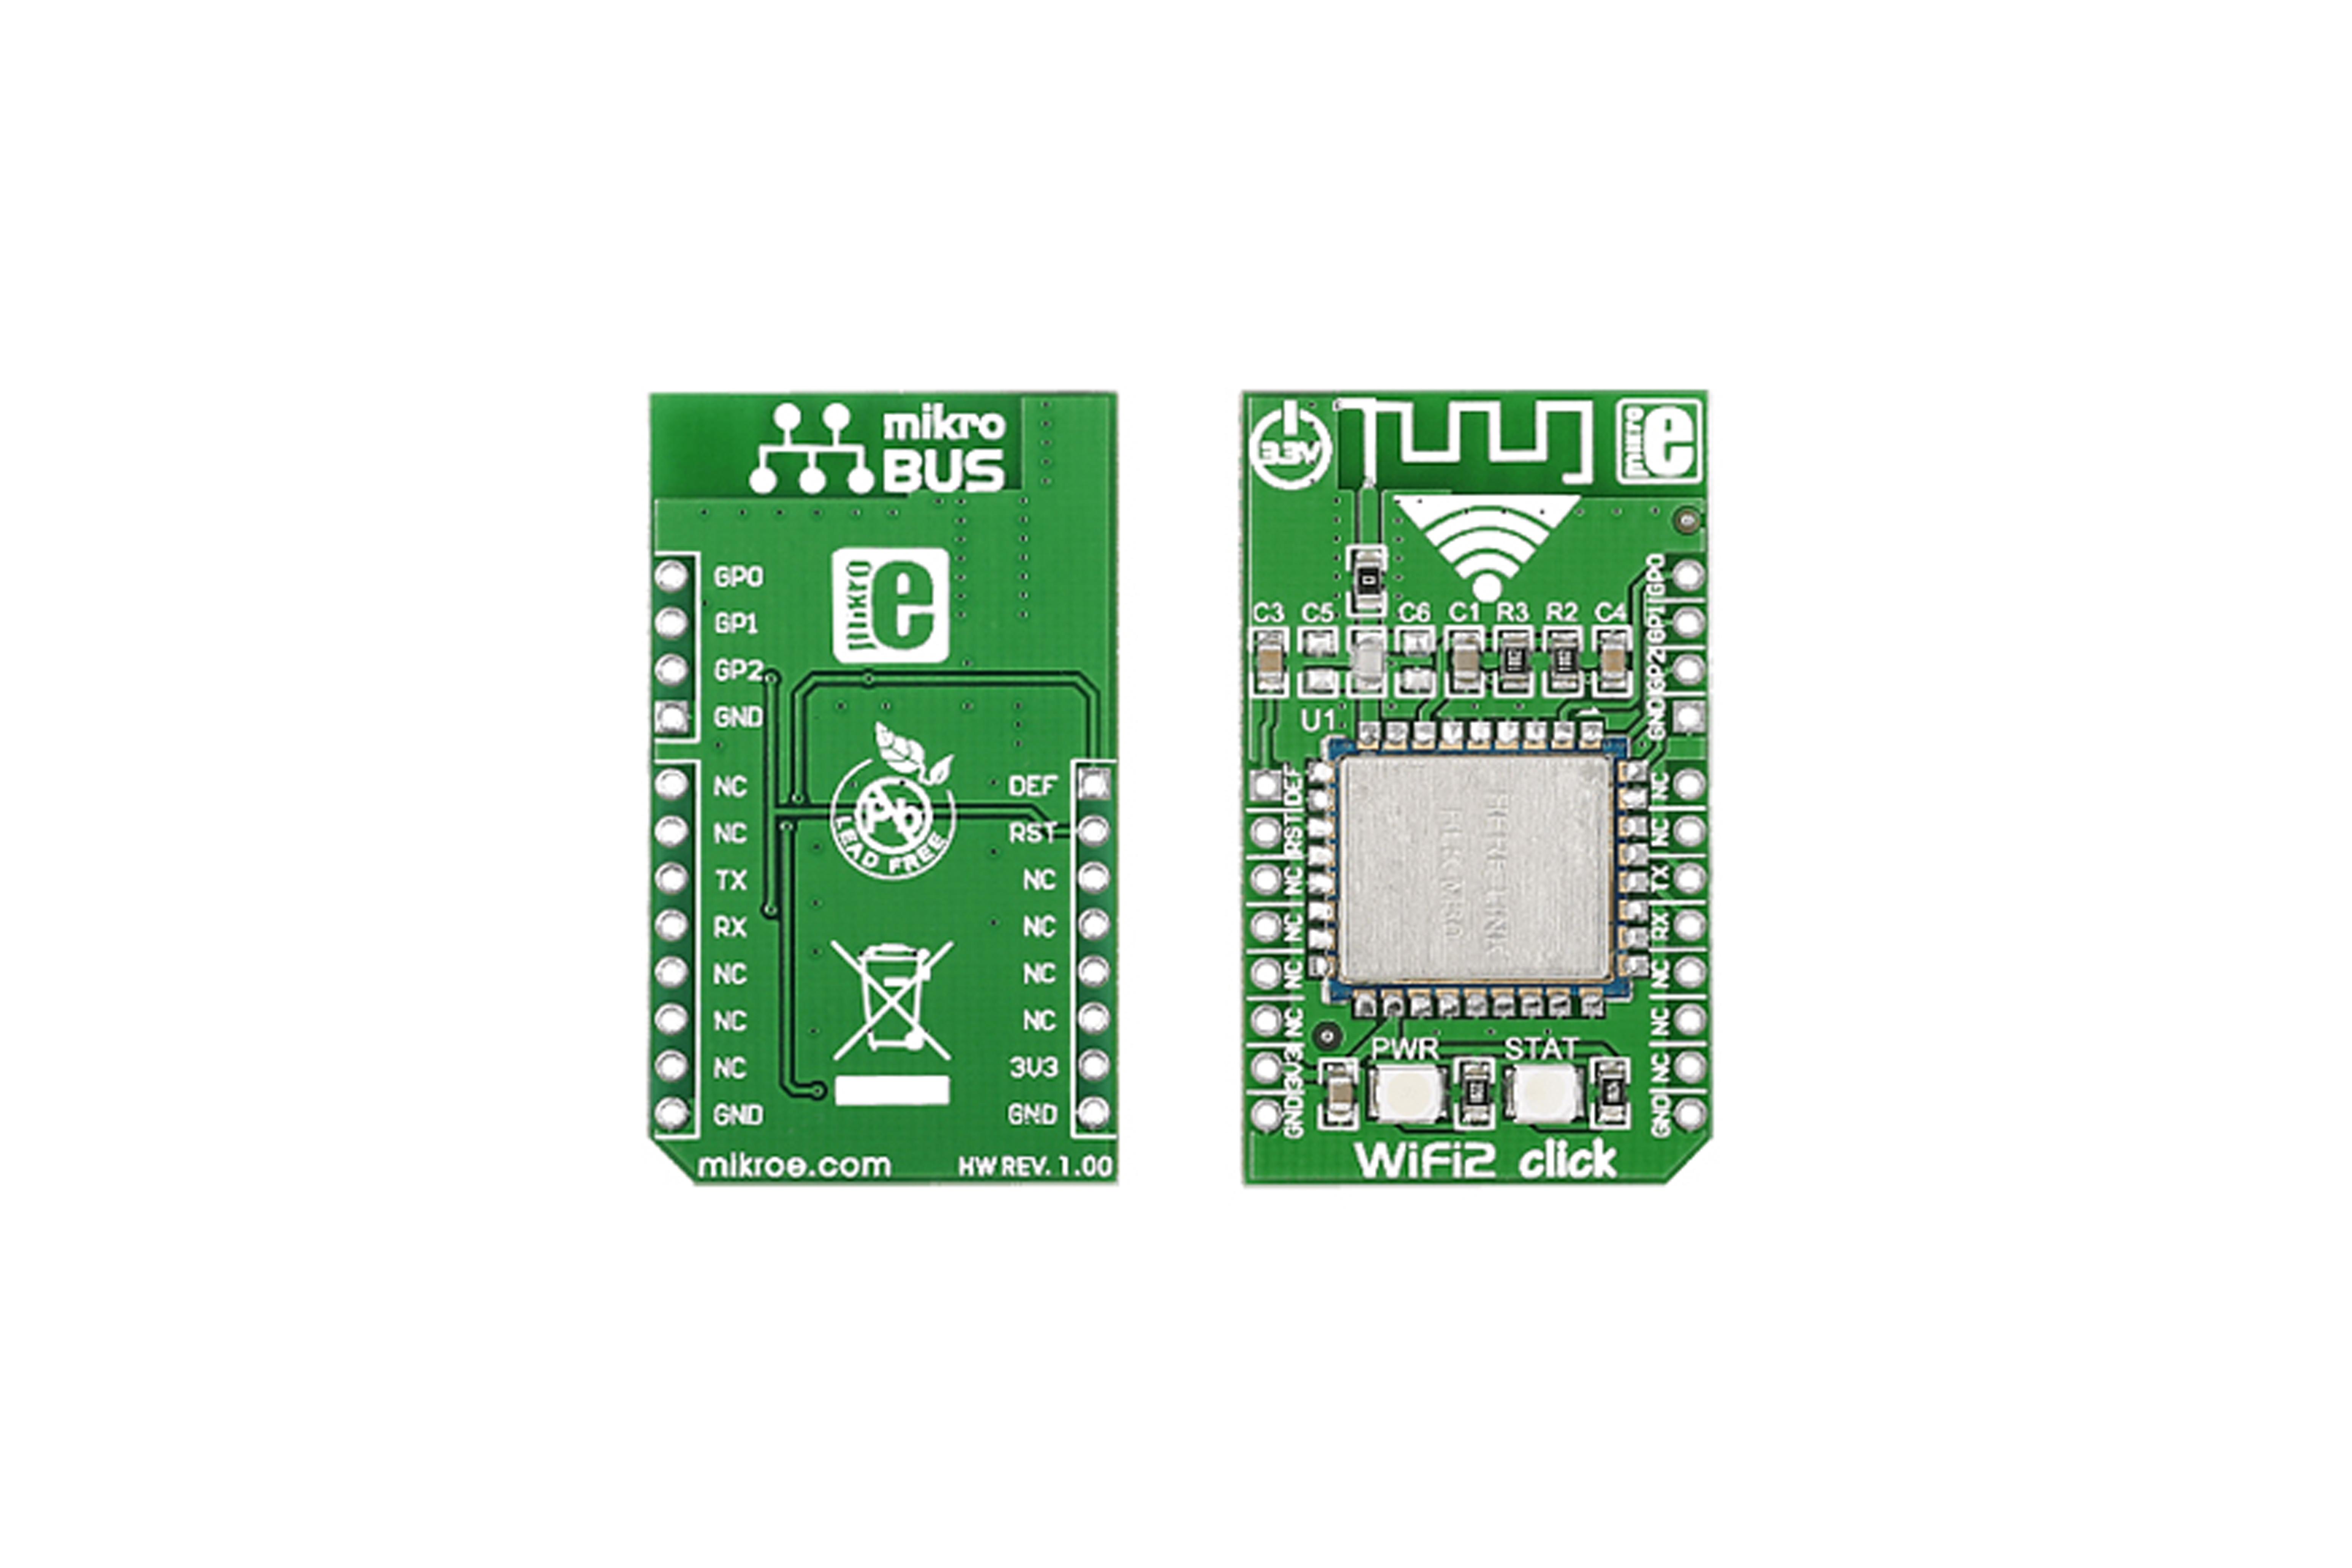 MikroElektronika wifi2 mikroBus Click Board voor HLK-M30